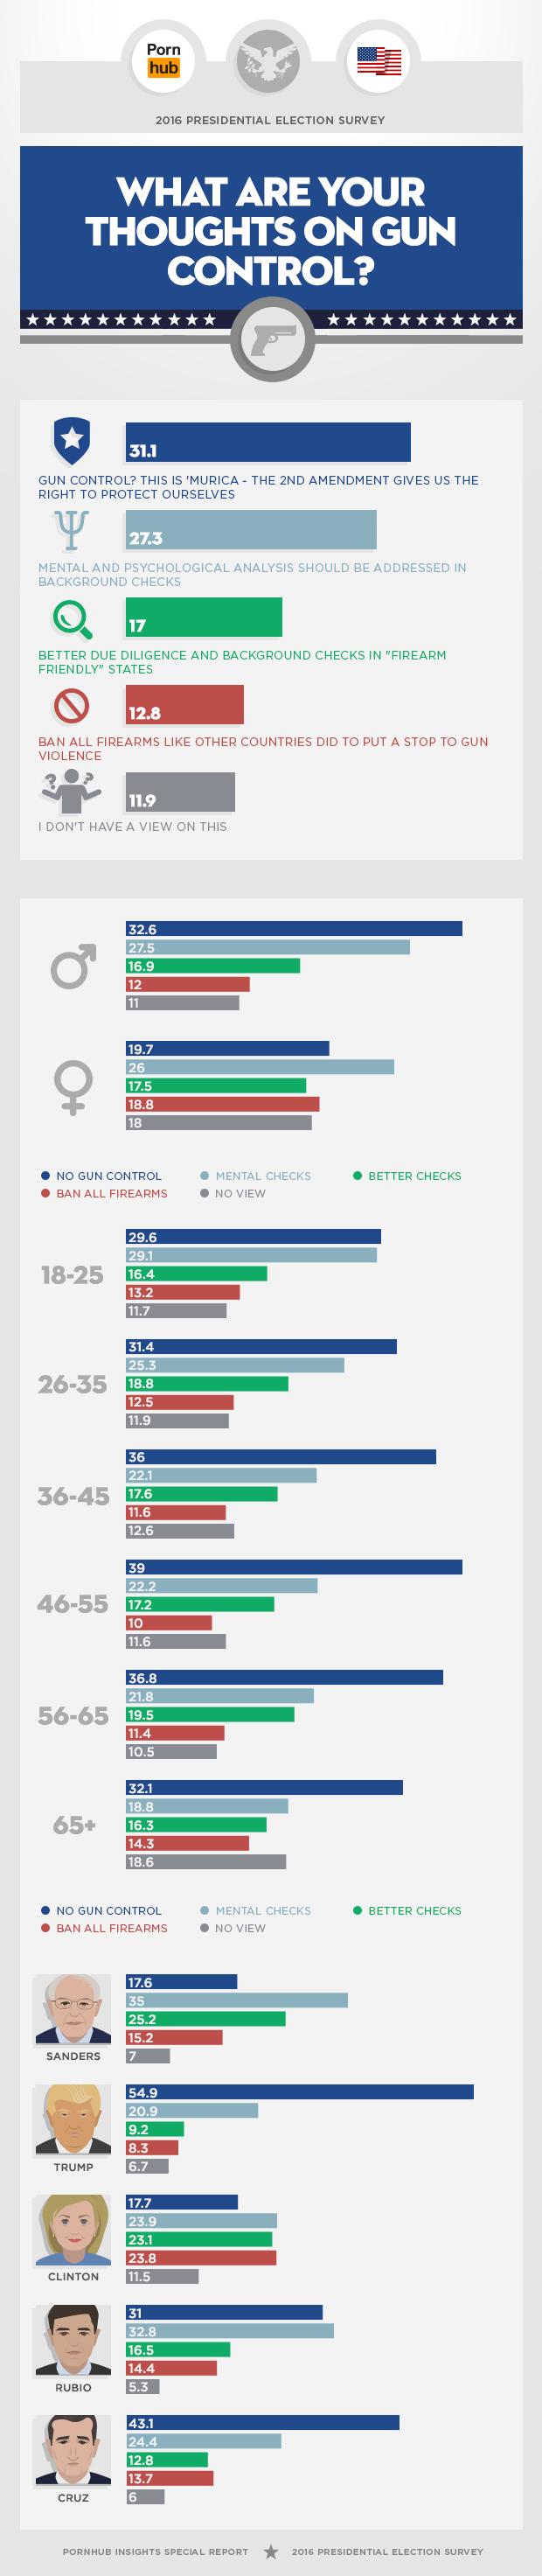 pornhub-2016-political-survey-gun-control